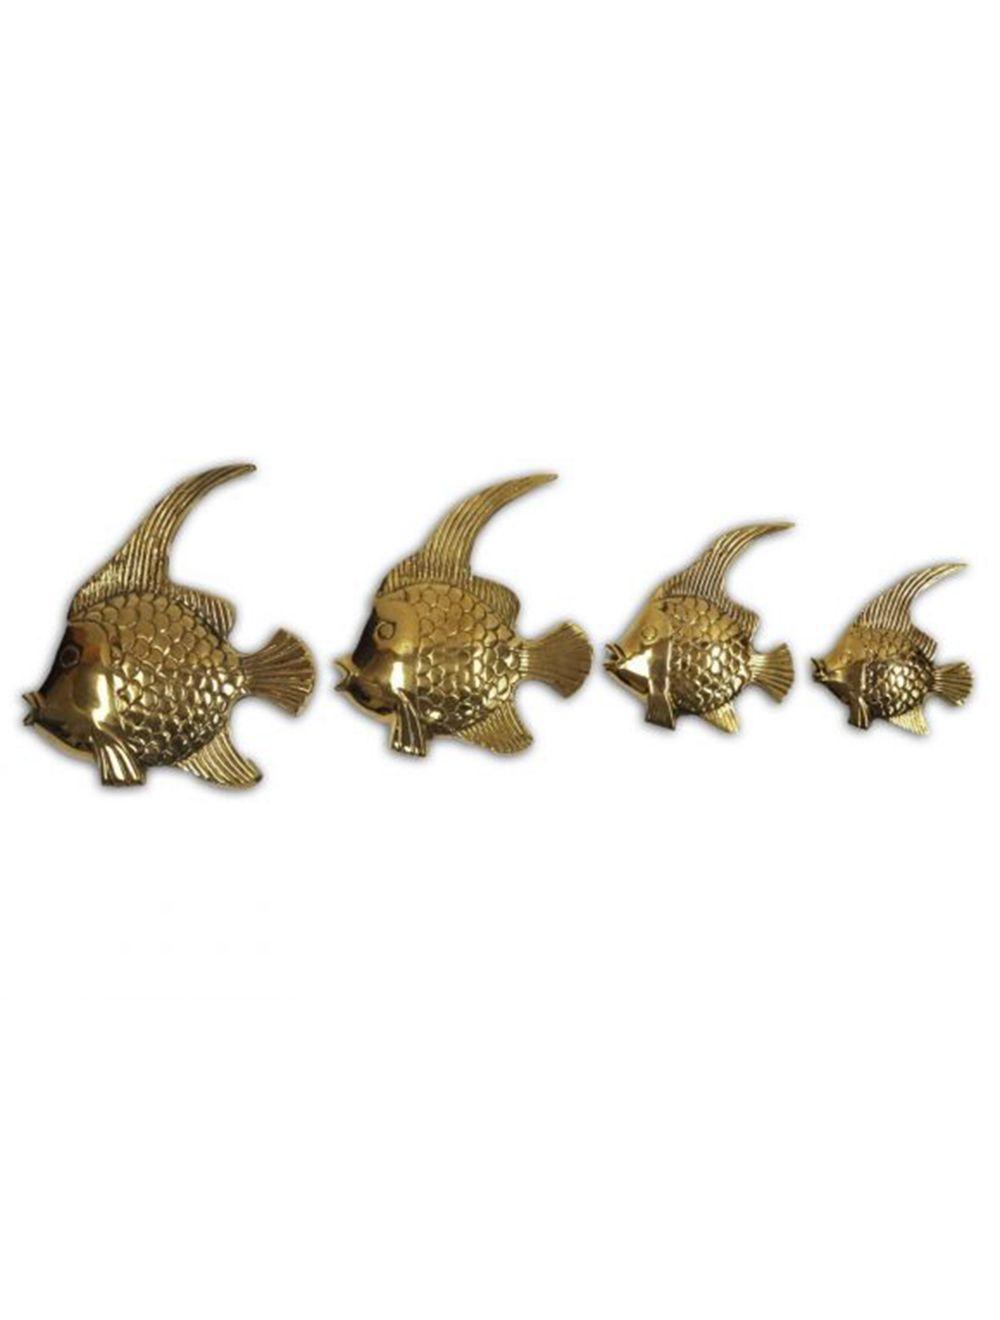 Brass Sea Gold Fish Set Of 4 Nautical Decor